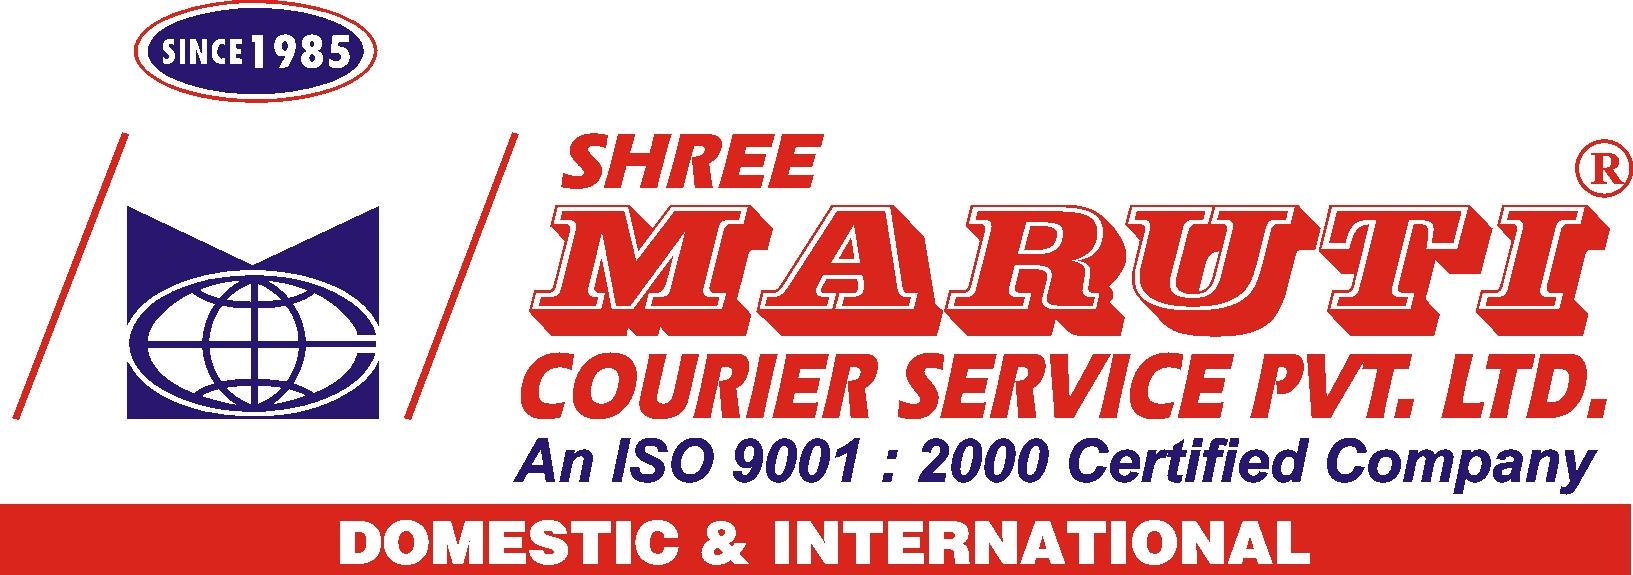 Dtcfast Shree Maruti Courier in Jabalpur